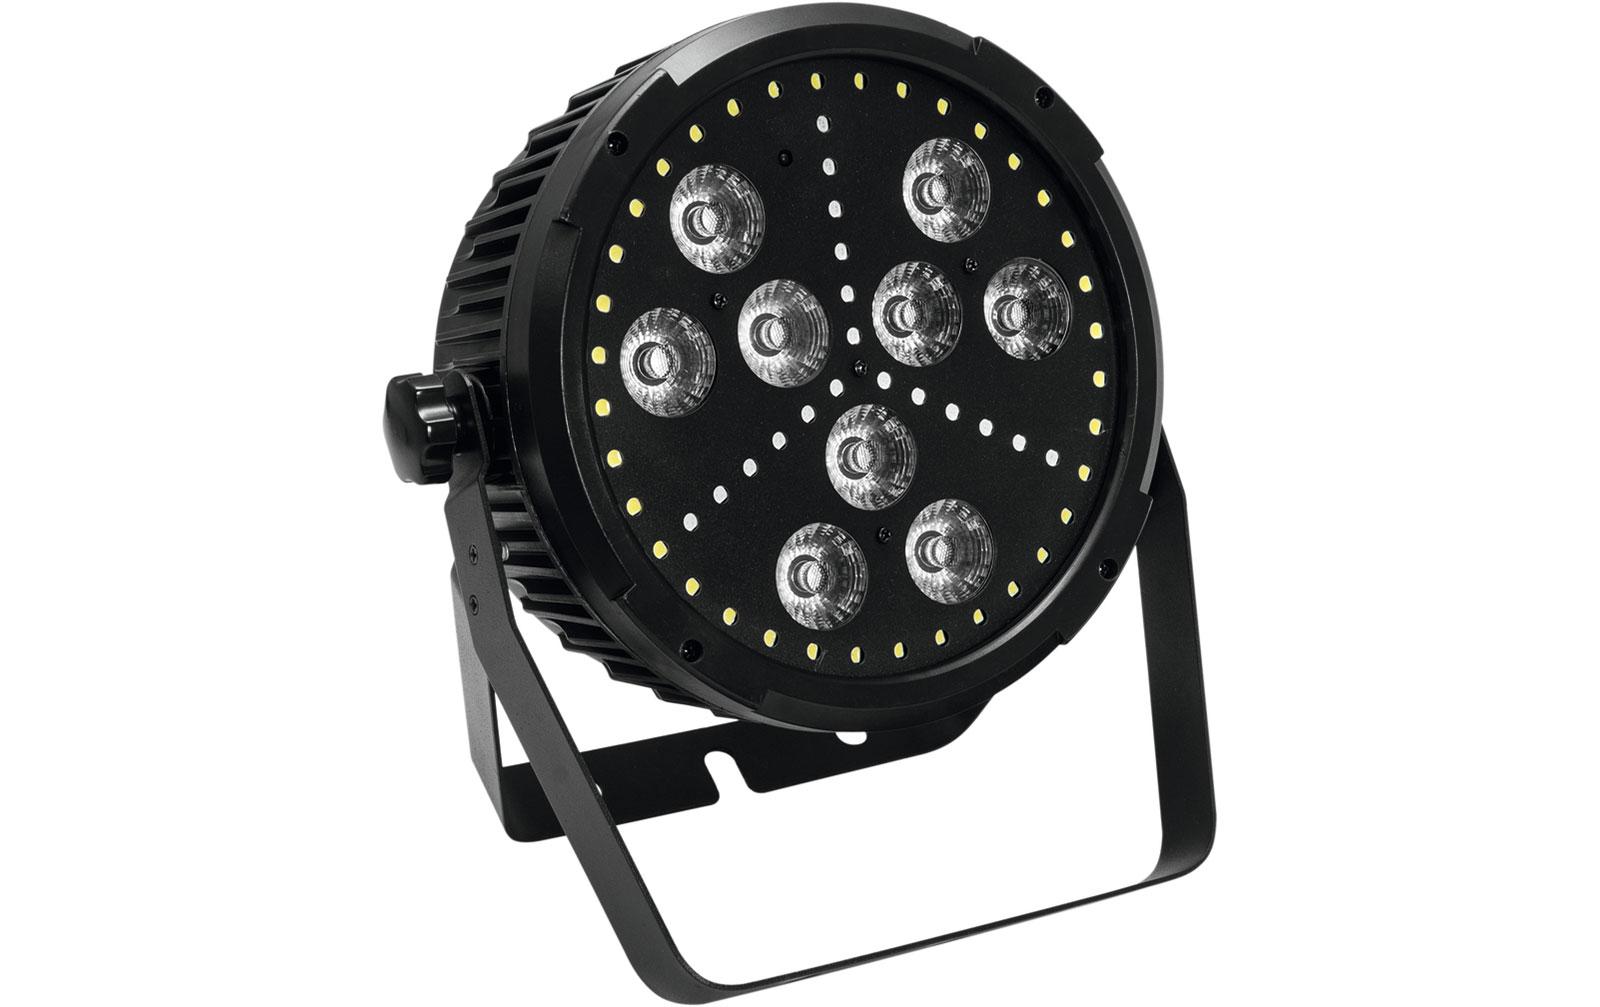 eurolite-led-sls-10-hybrid-hcl